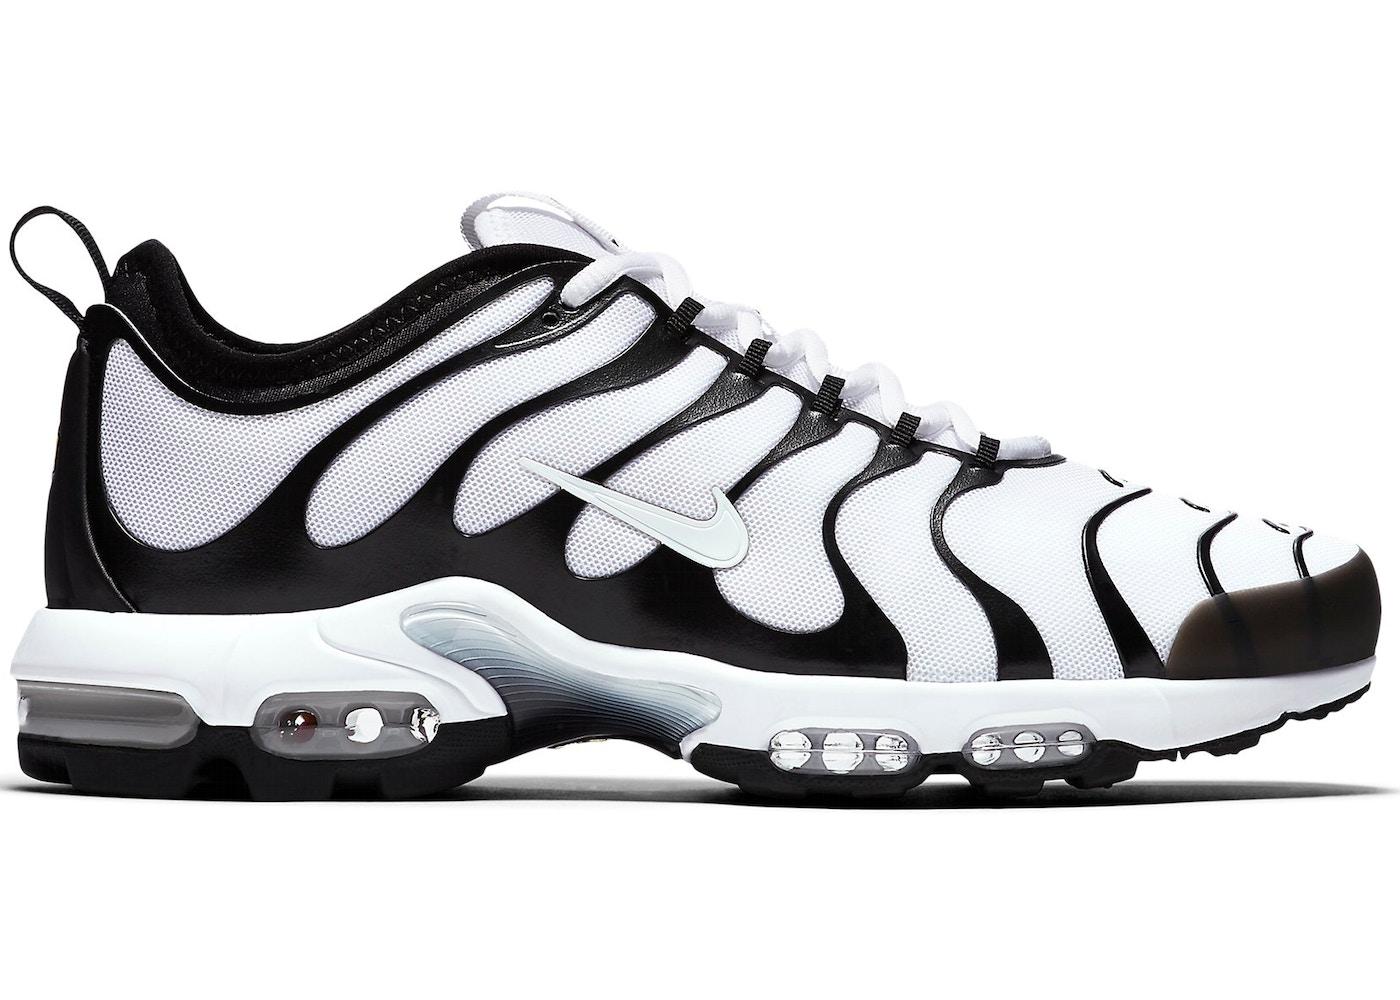 Nike Air Max Plus TN Ultra White Black